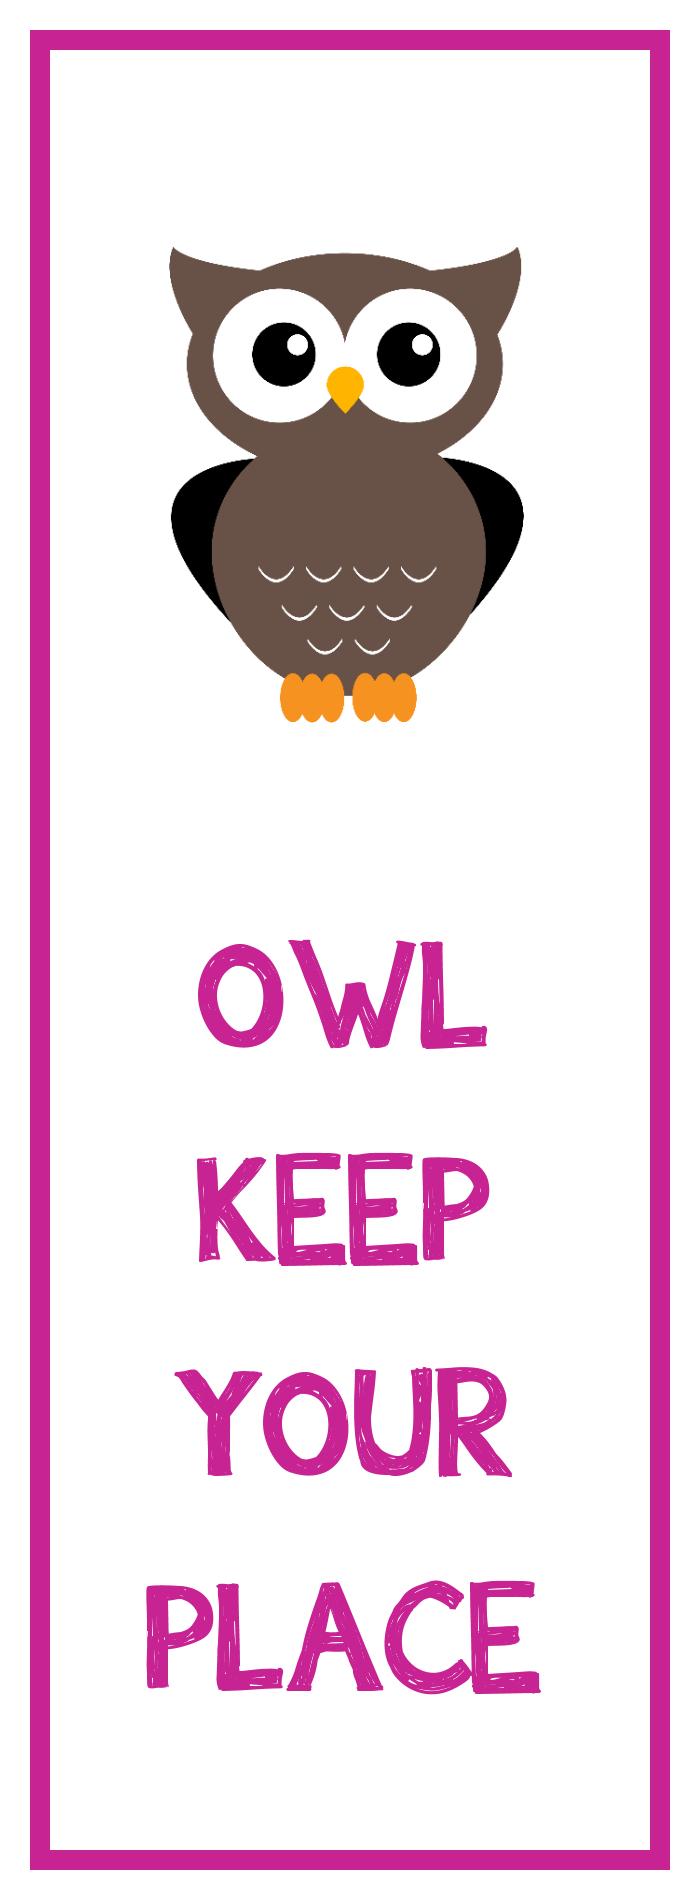 Owl Bookmark Printable - Free Printable Owl Bookmarks